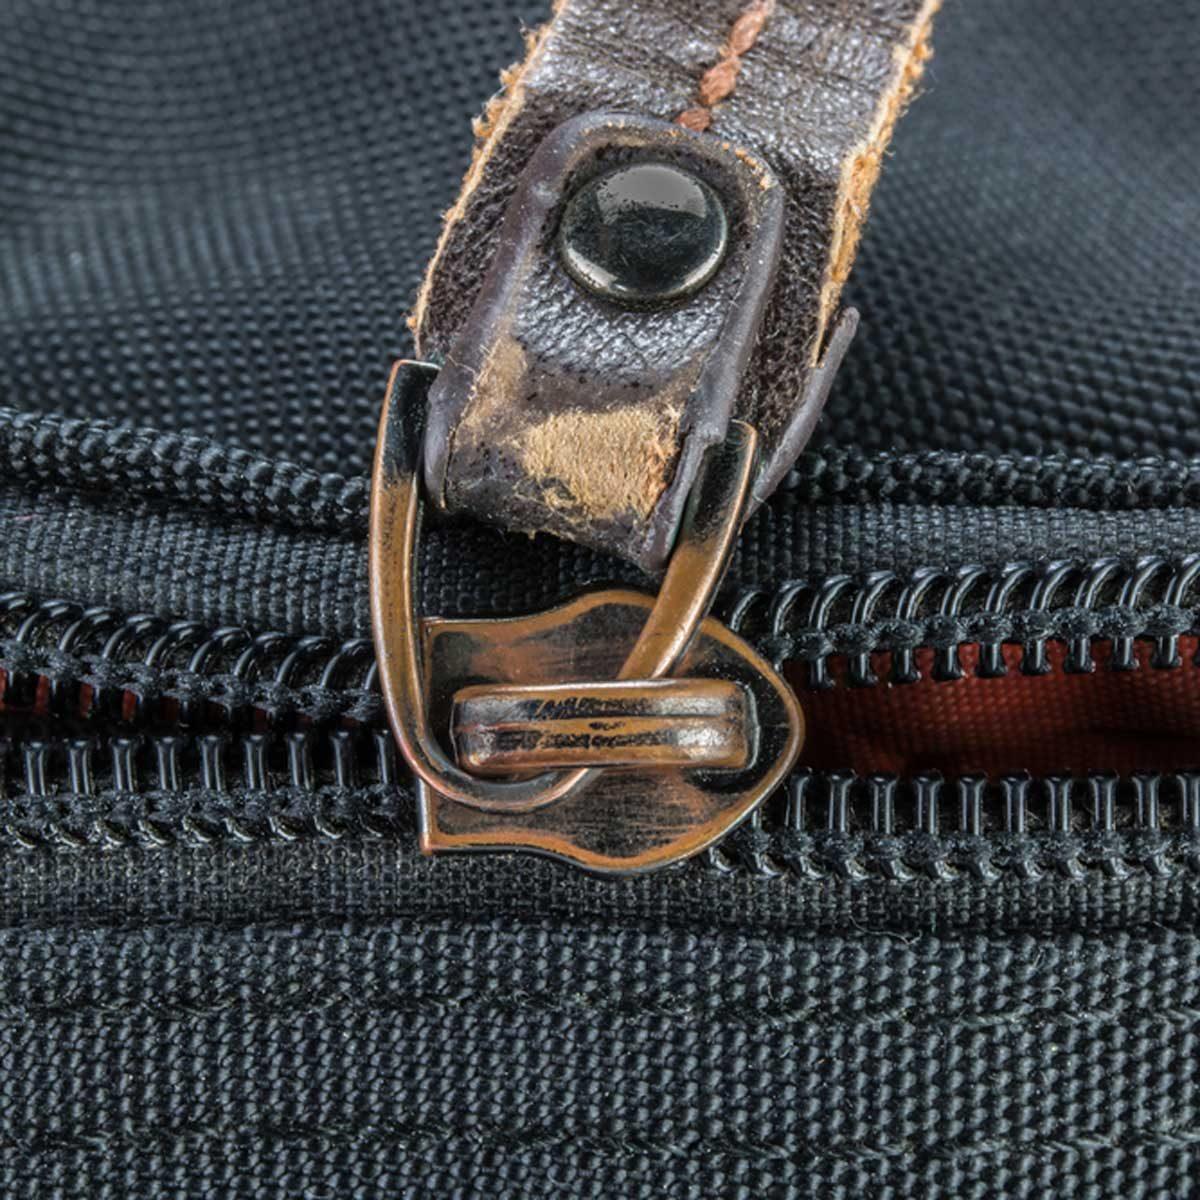 putting zipper slider back on